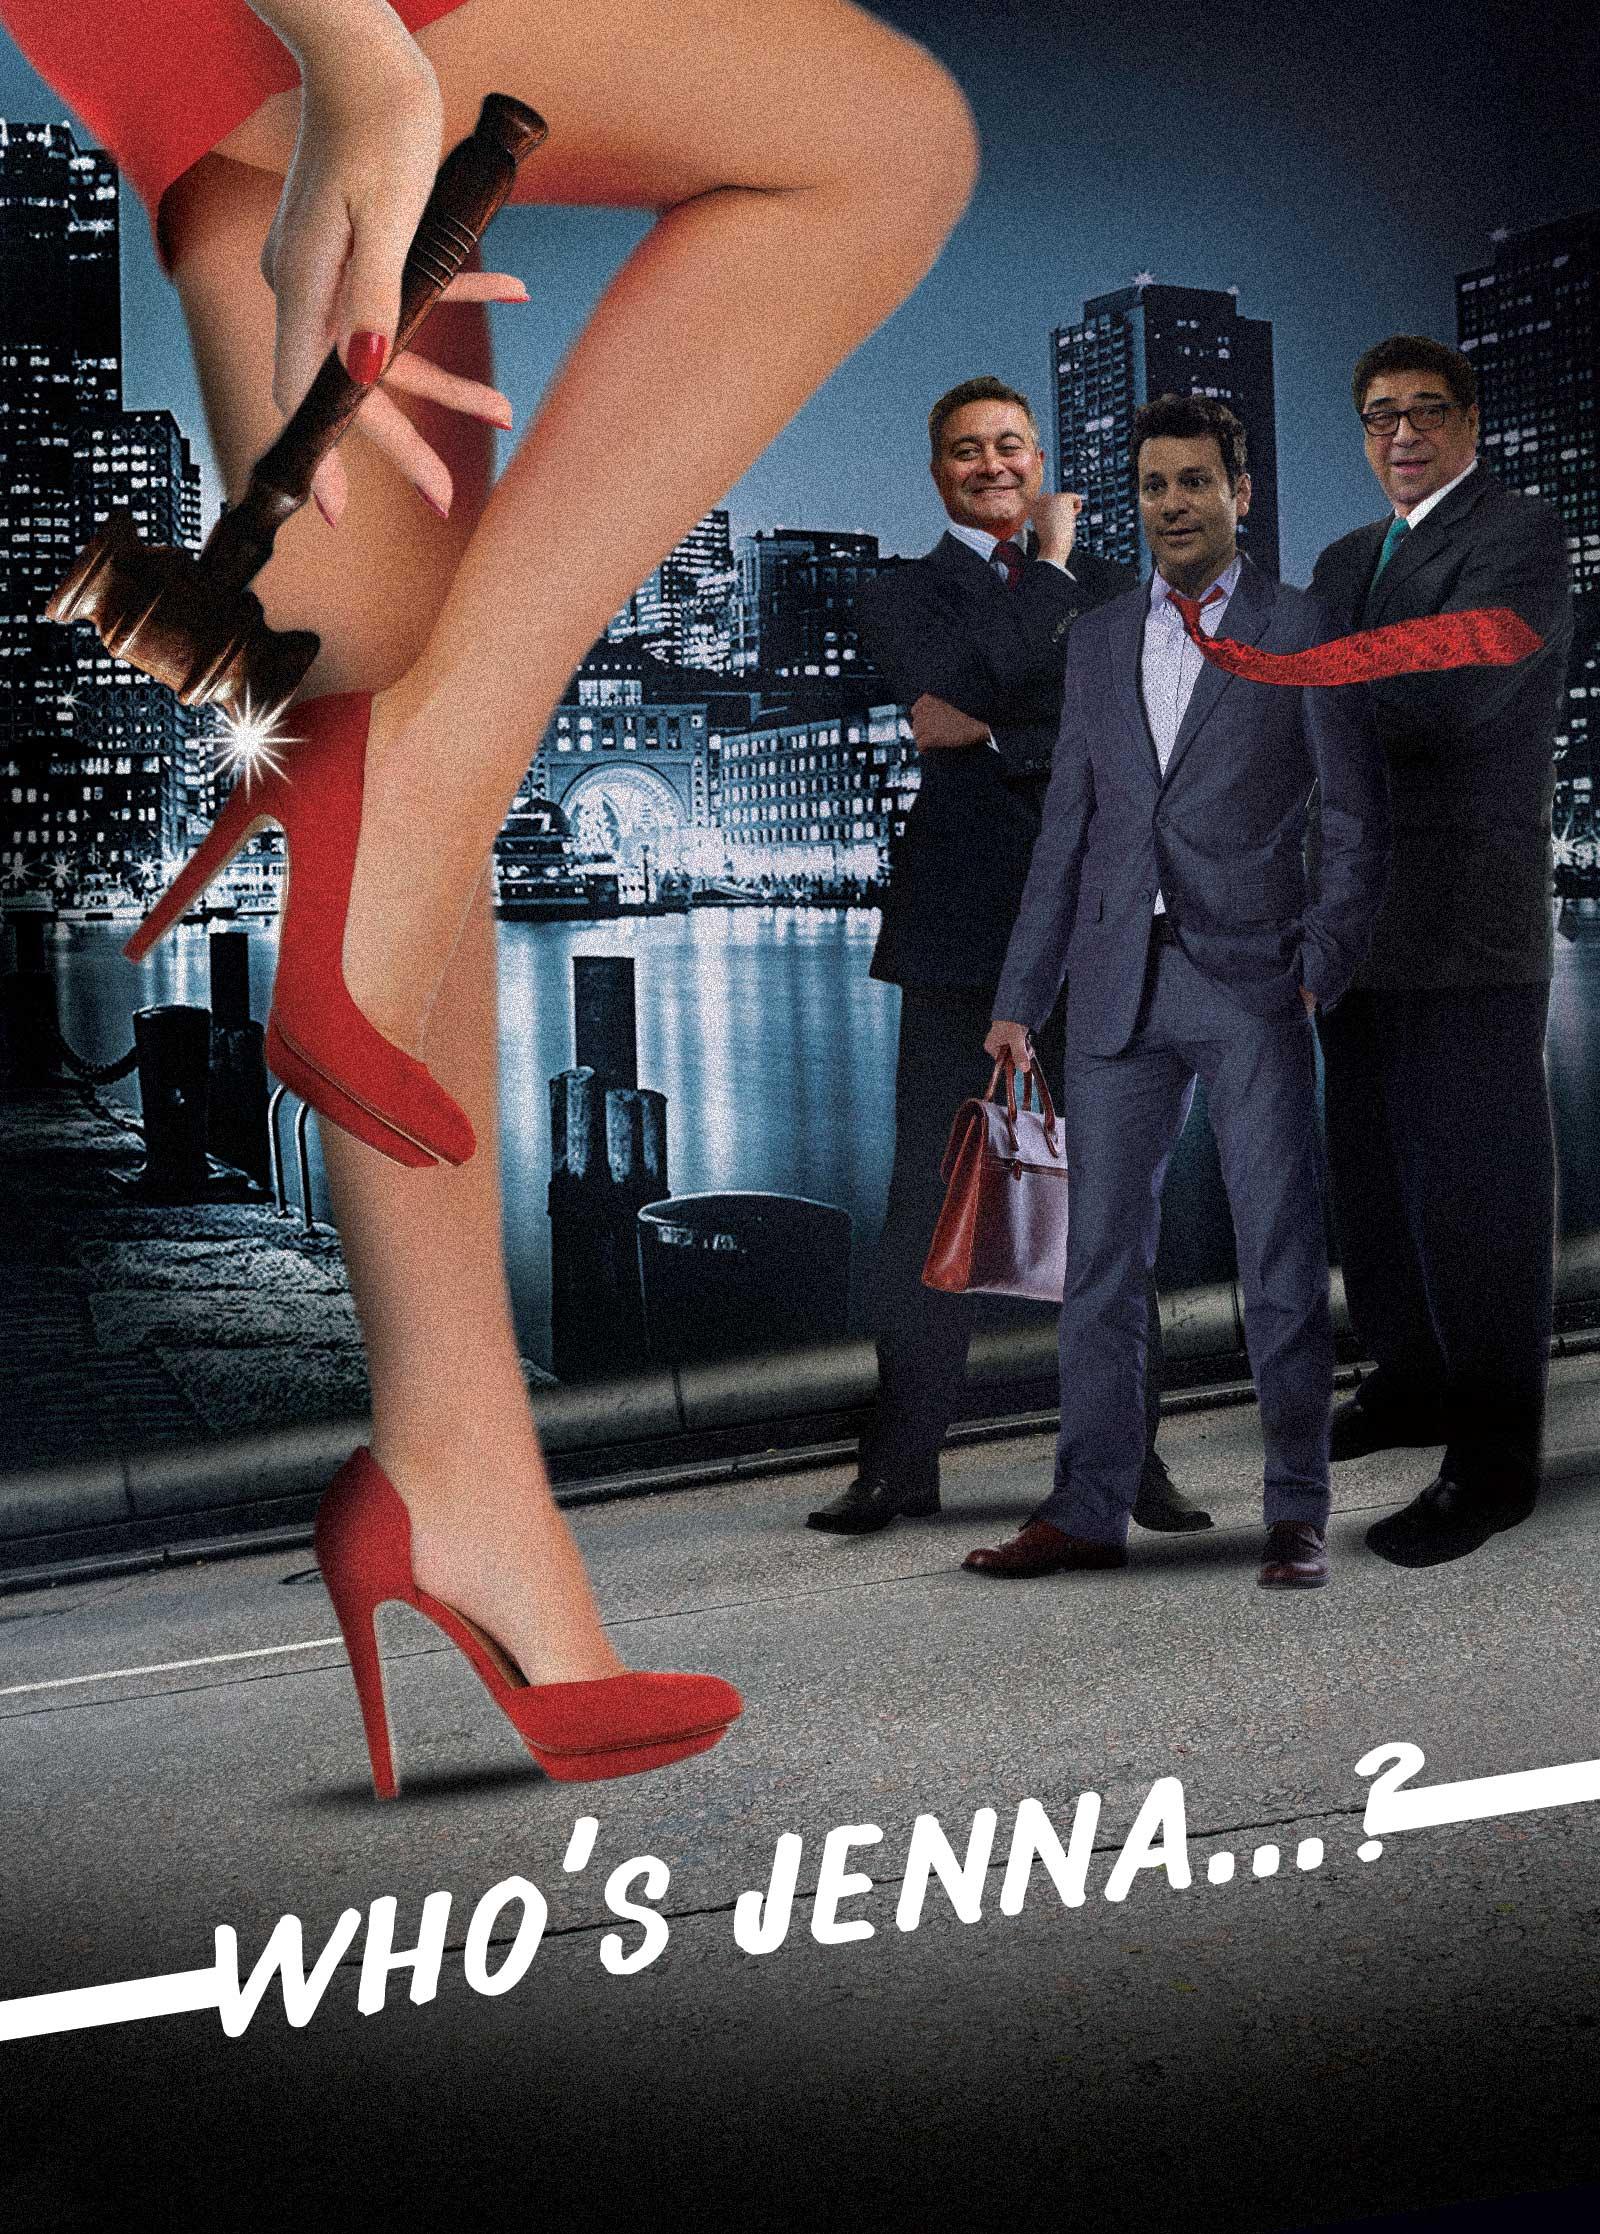 WhosJenna_Movie_Poster